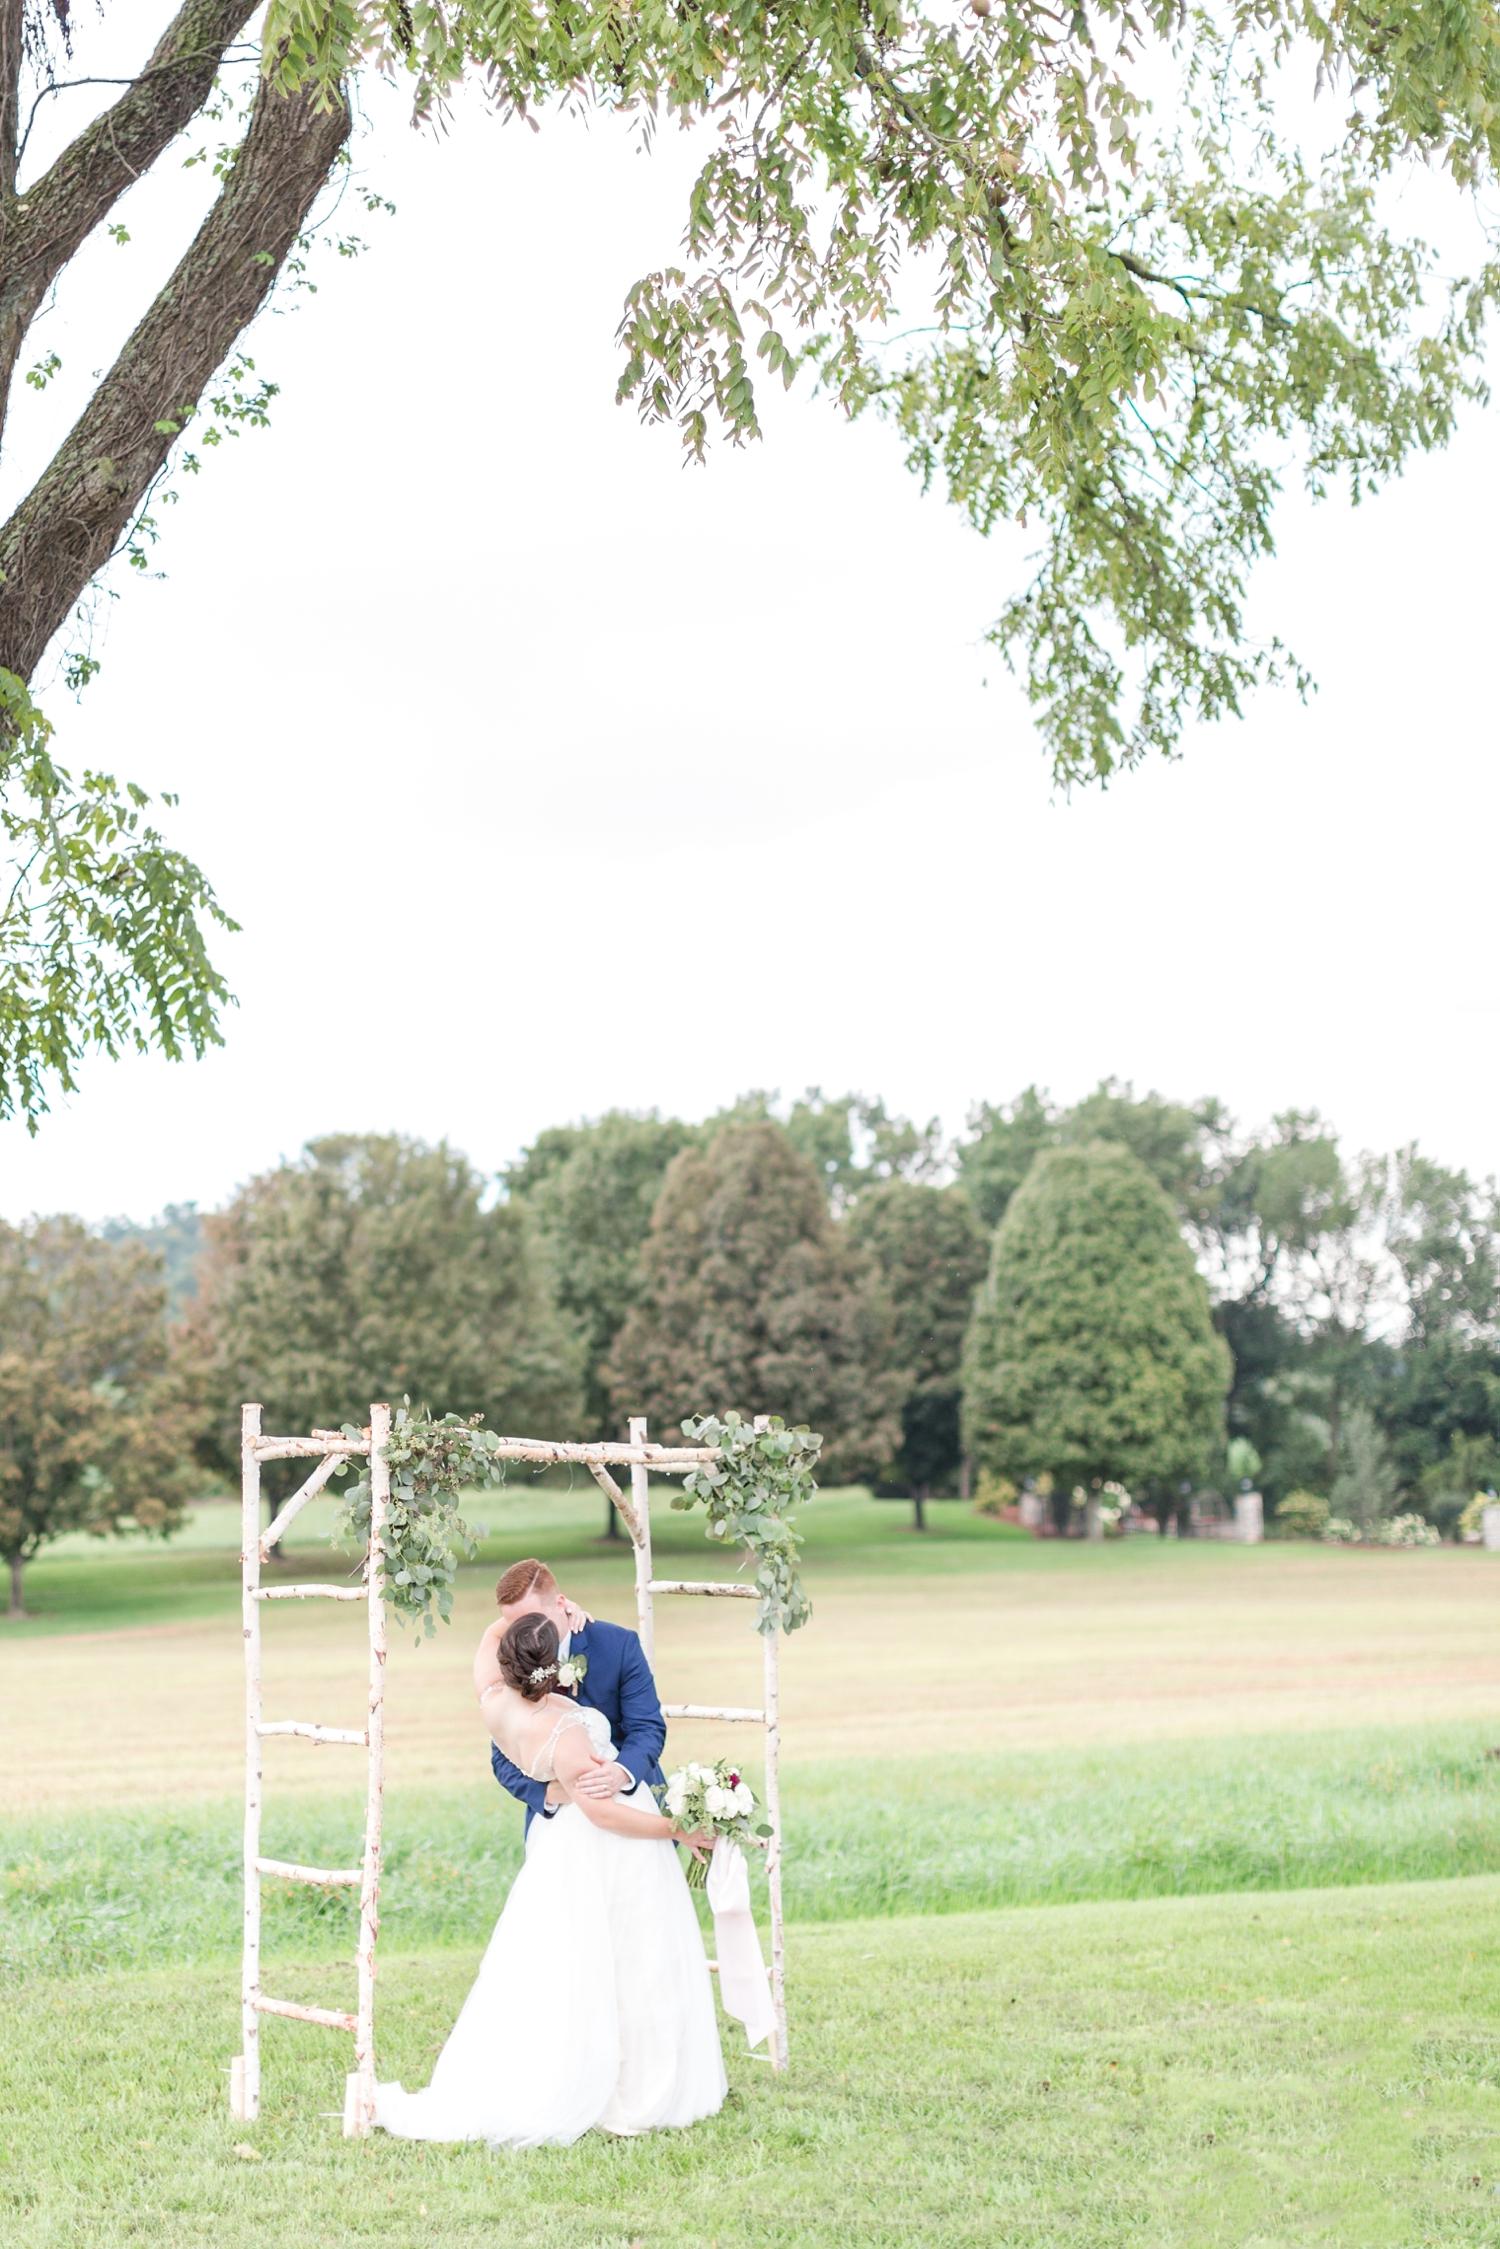 ADKINS WEDDING HIGHLIGHTS-200_The-Granary-wedding-Valley-Pike-Farm-Market-Virginia-wedding-photographer-anna-grace-photography-photo.jpg